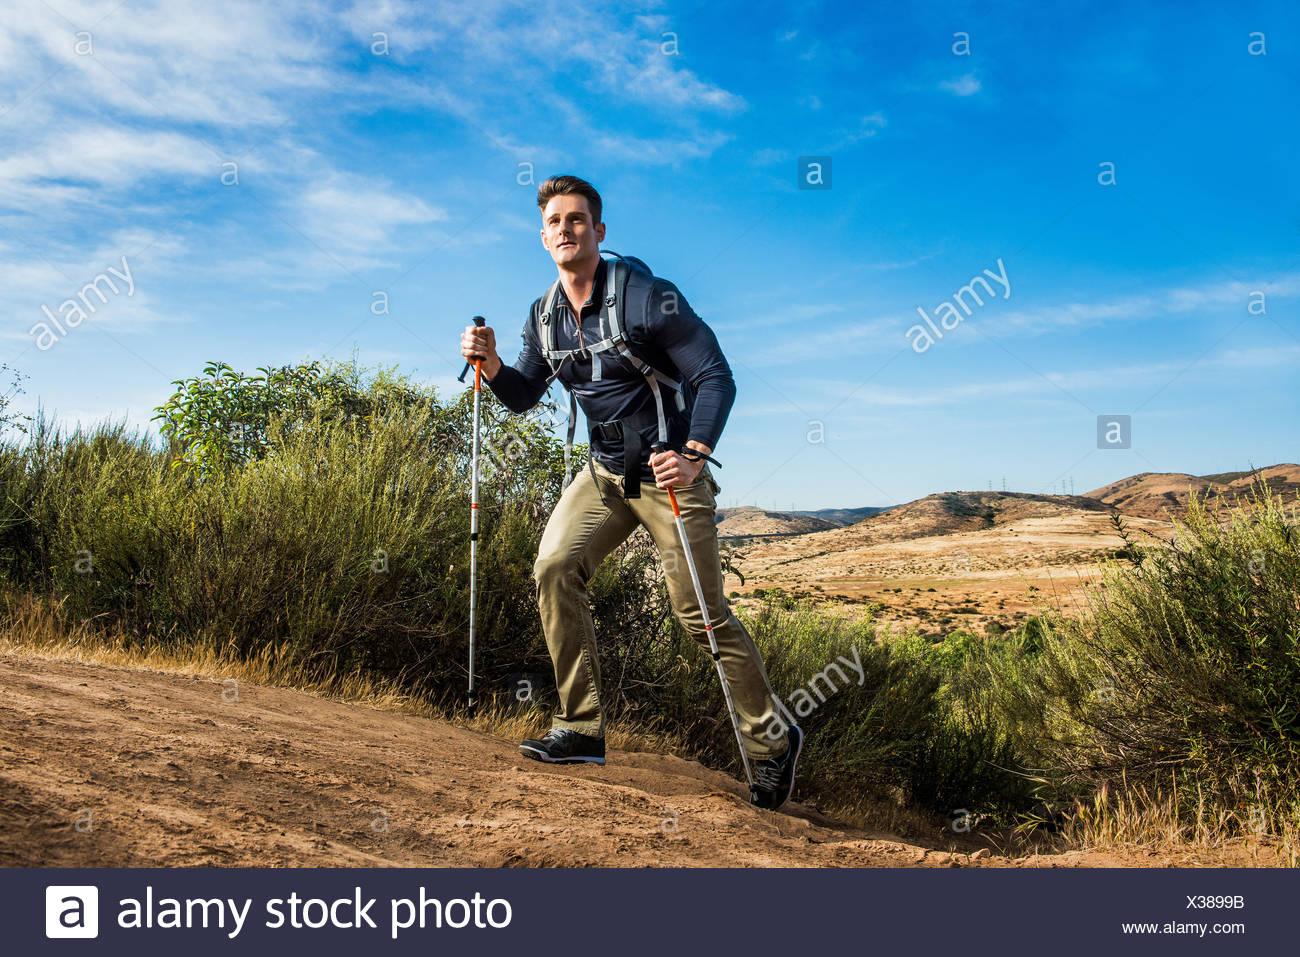 Male hiker en milieu rural Photo Stock